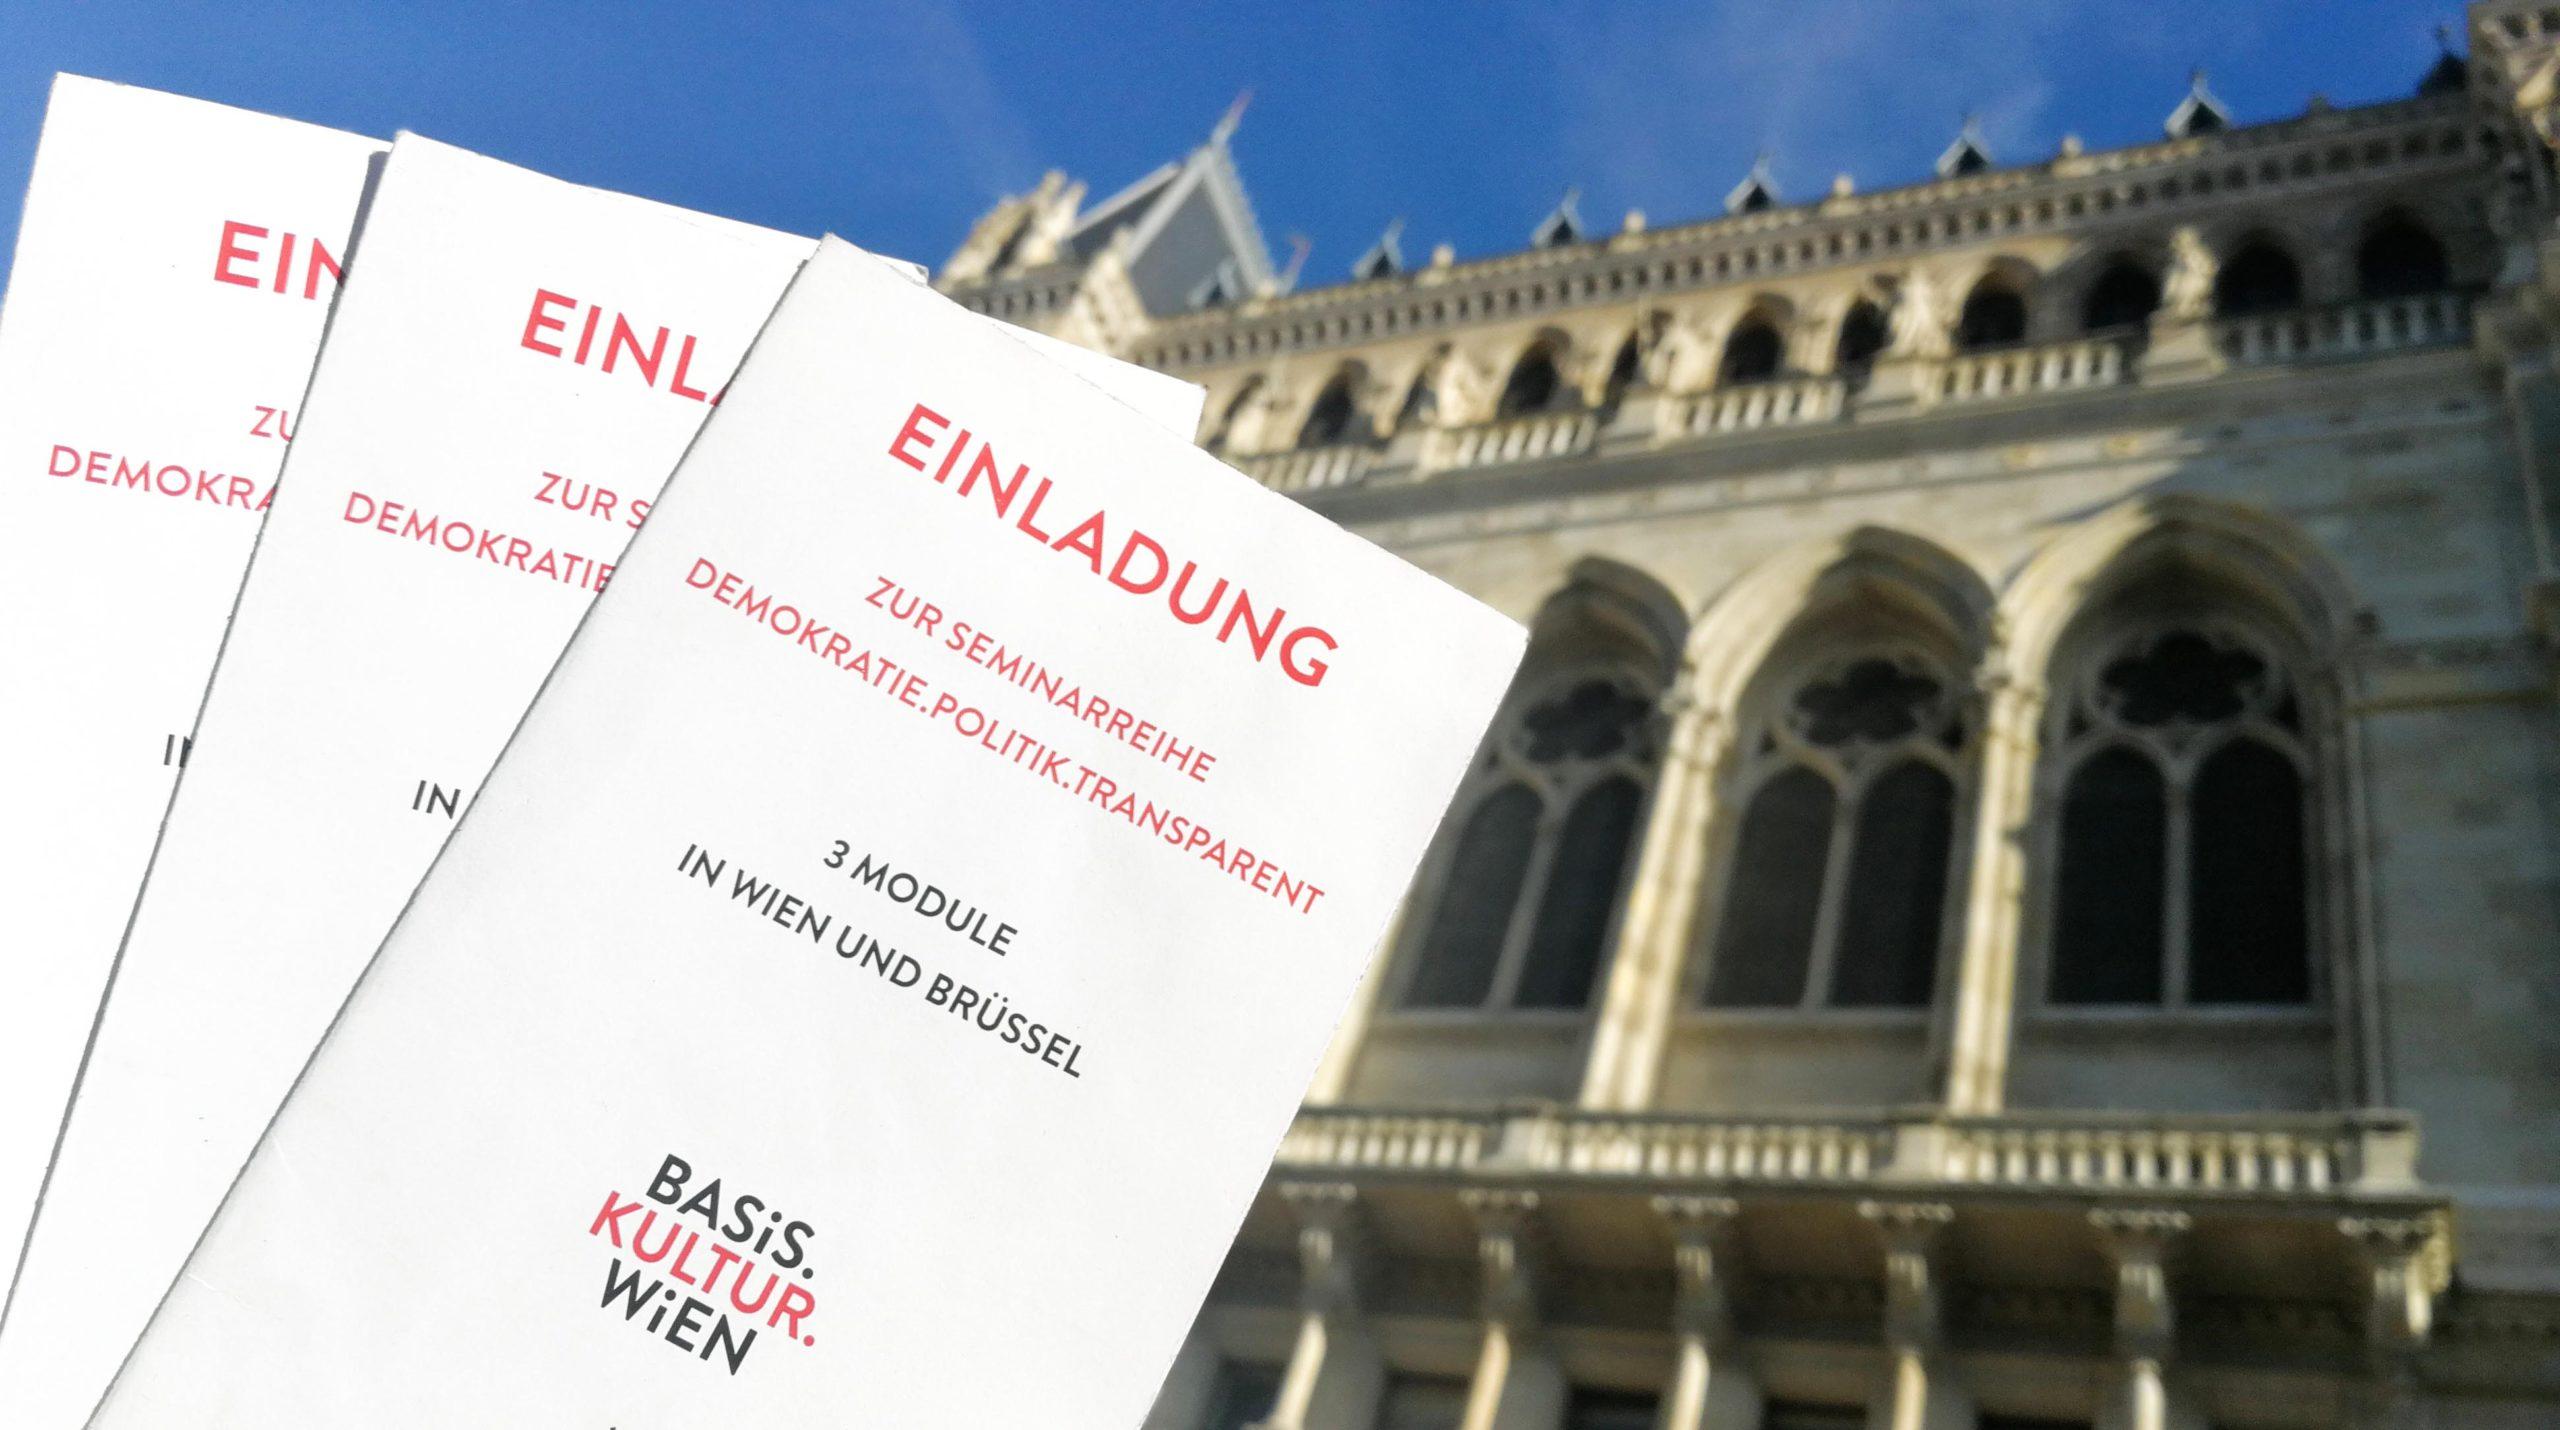 Demokratie.Politik.transparent - Modul 2: Bundespolitik live